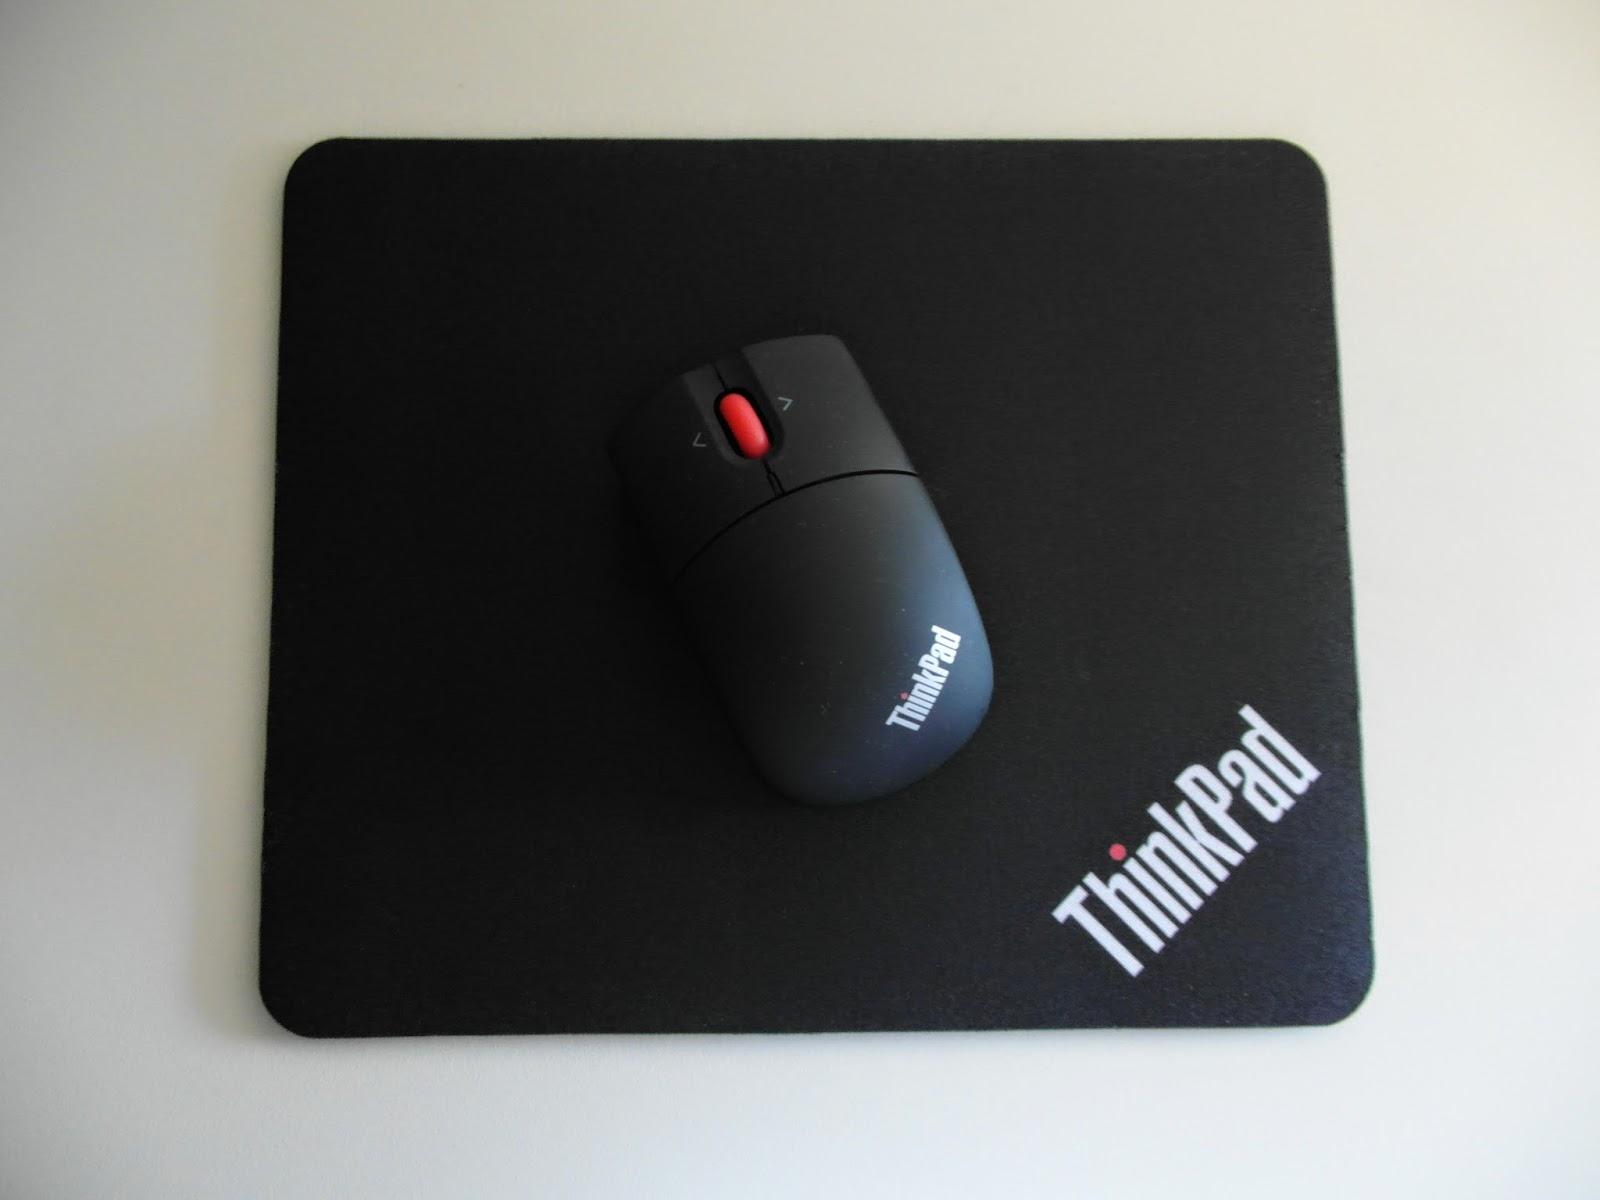 G35 Suck Fs Lenovo Thinkpad Mouse Pad